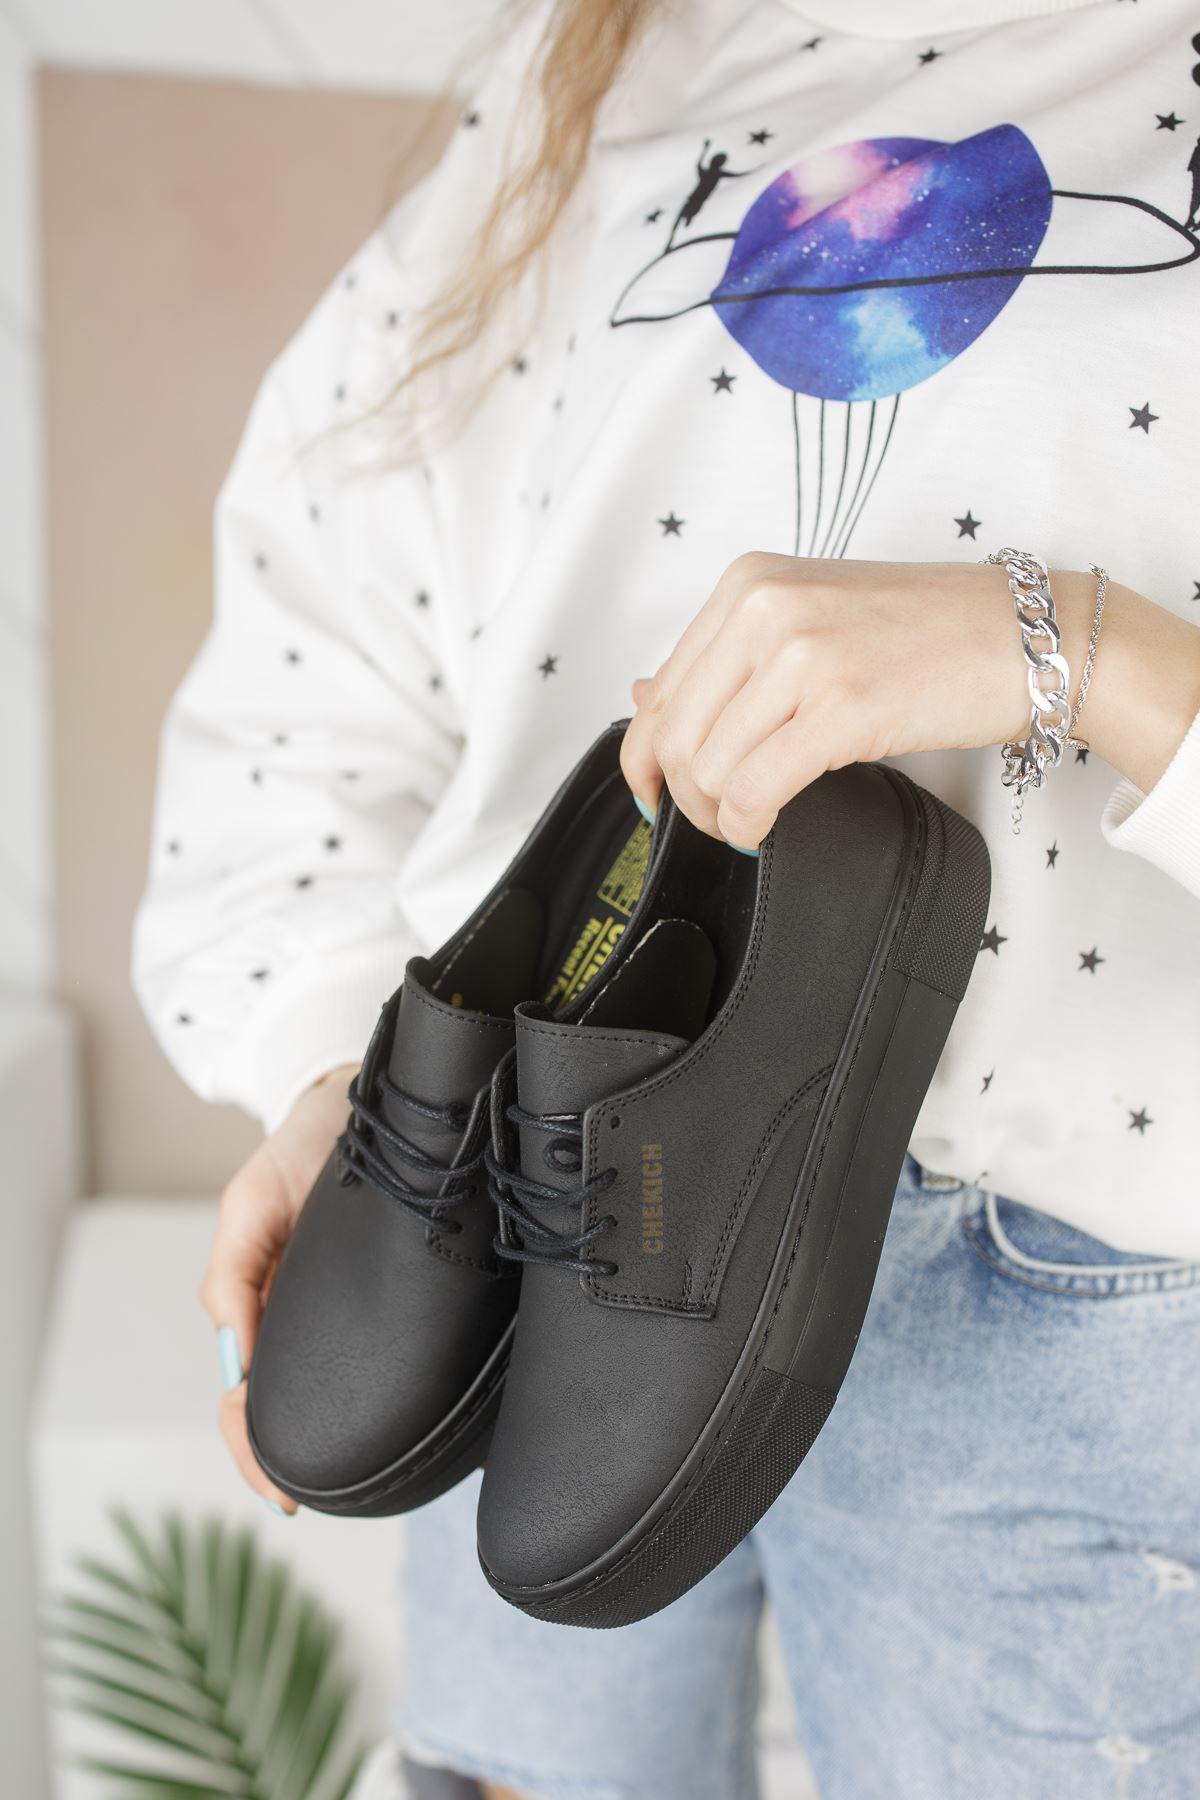 Chekich CH005 ST Kadın Ayakkabı SIYAH